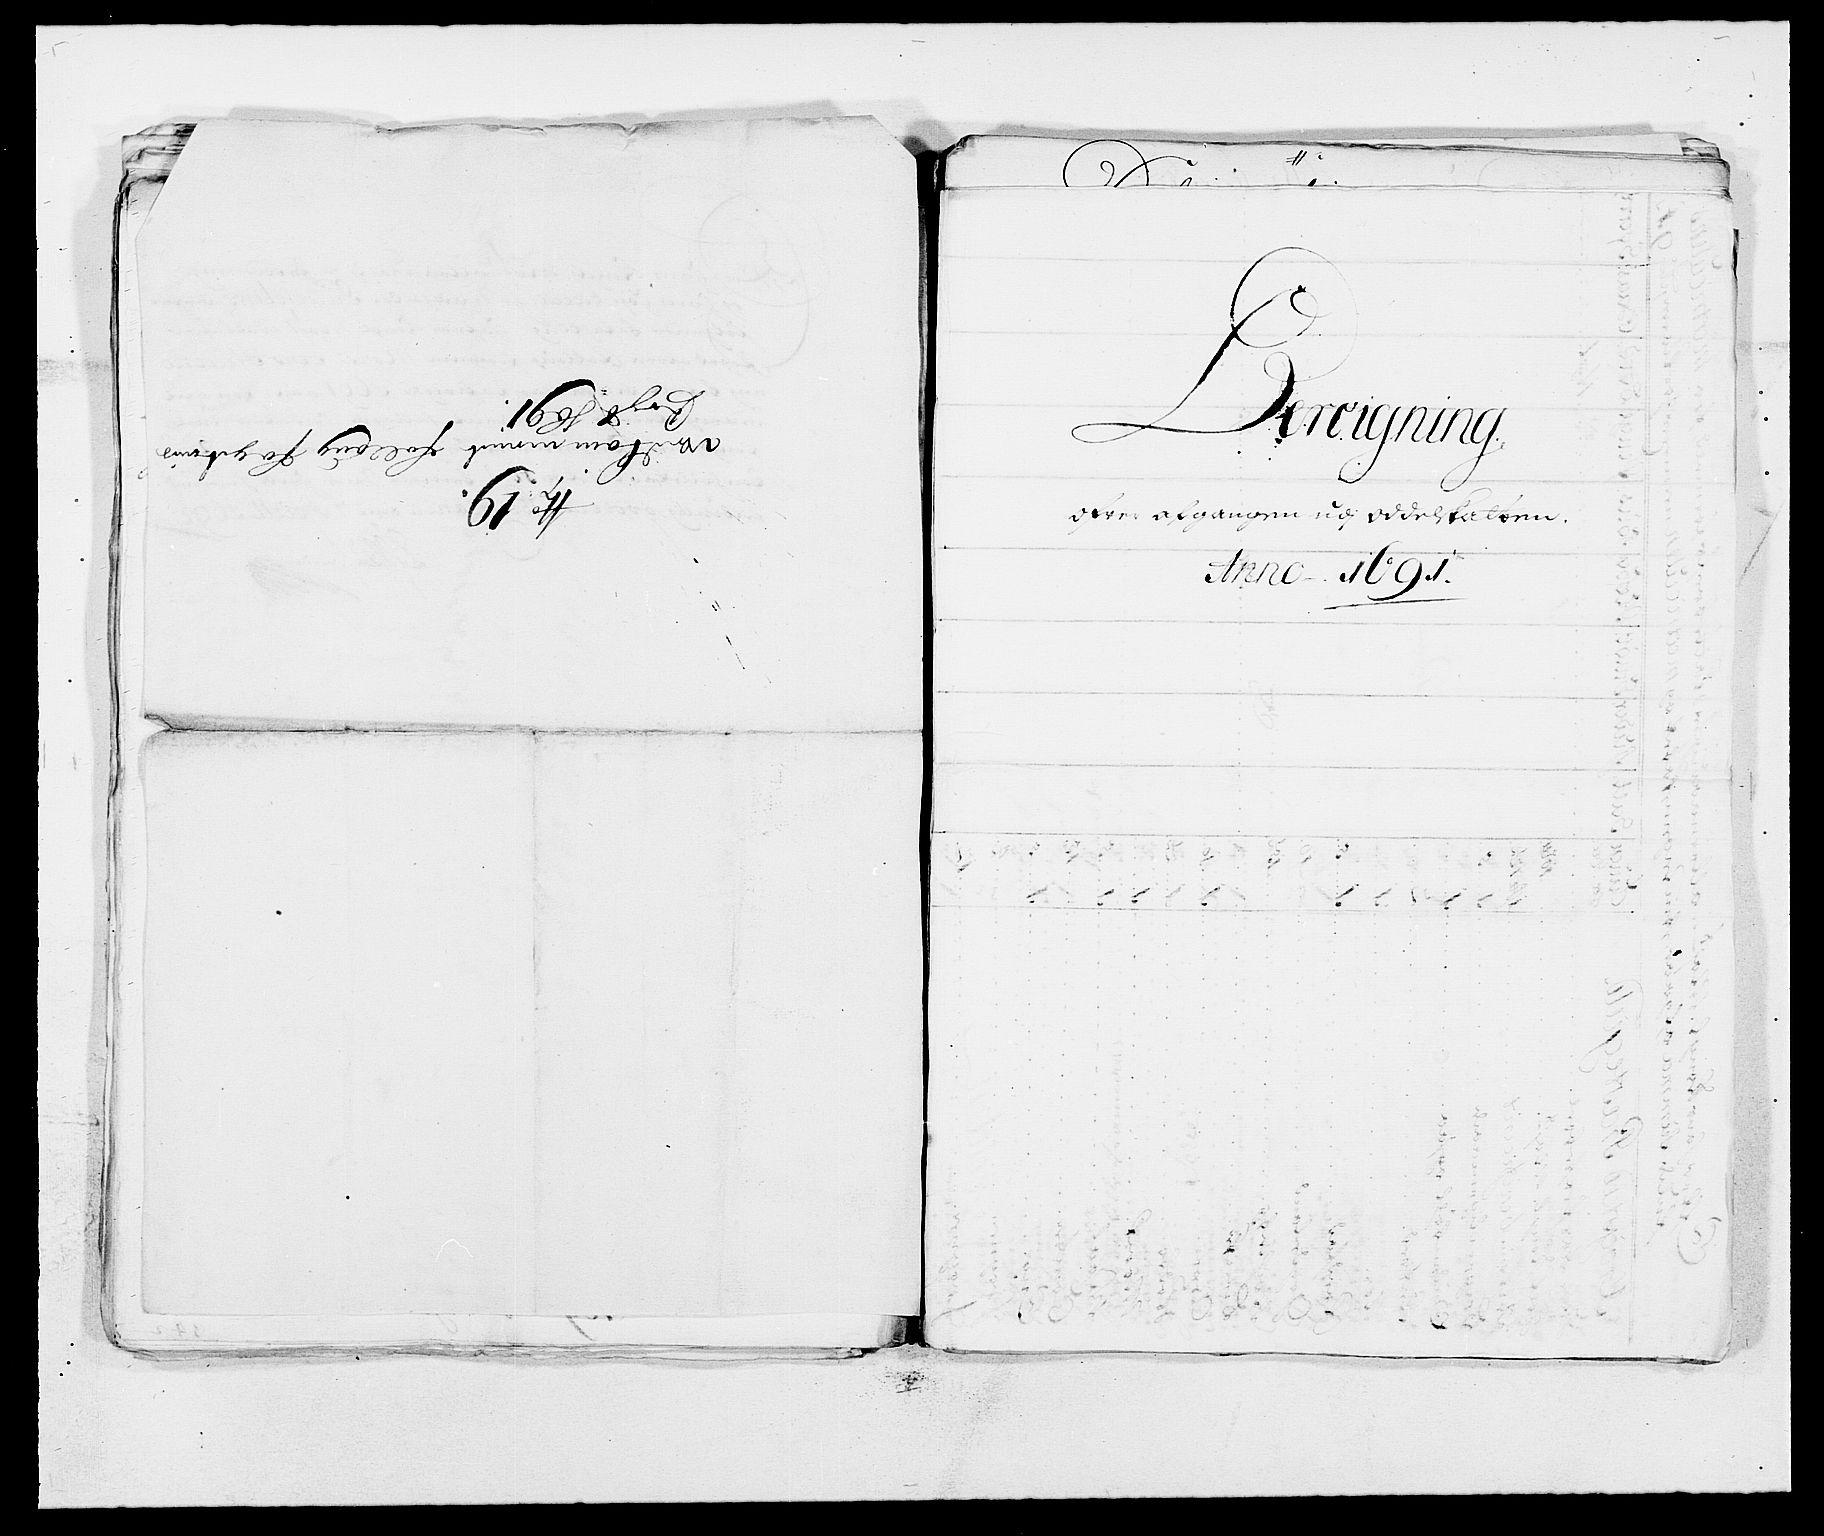 RA, Rentekammeret inntil 1814, Reviderte regnskaper, Fogderegnskap, R09/L0436: Fogderegnskap Follo, 1685-1691, s. 232